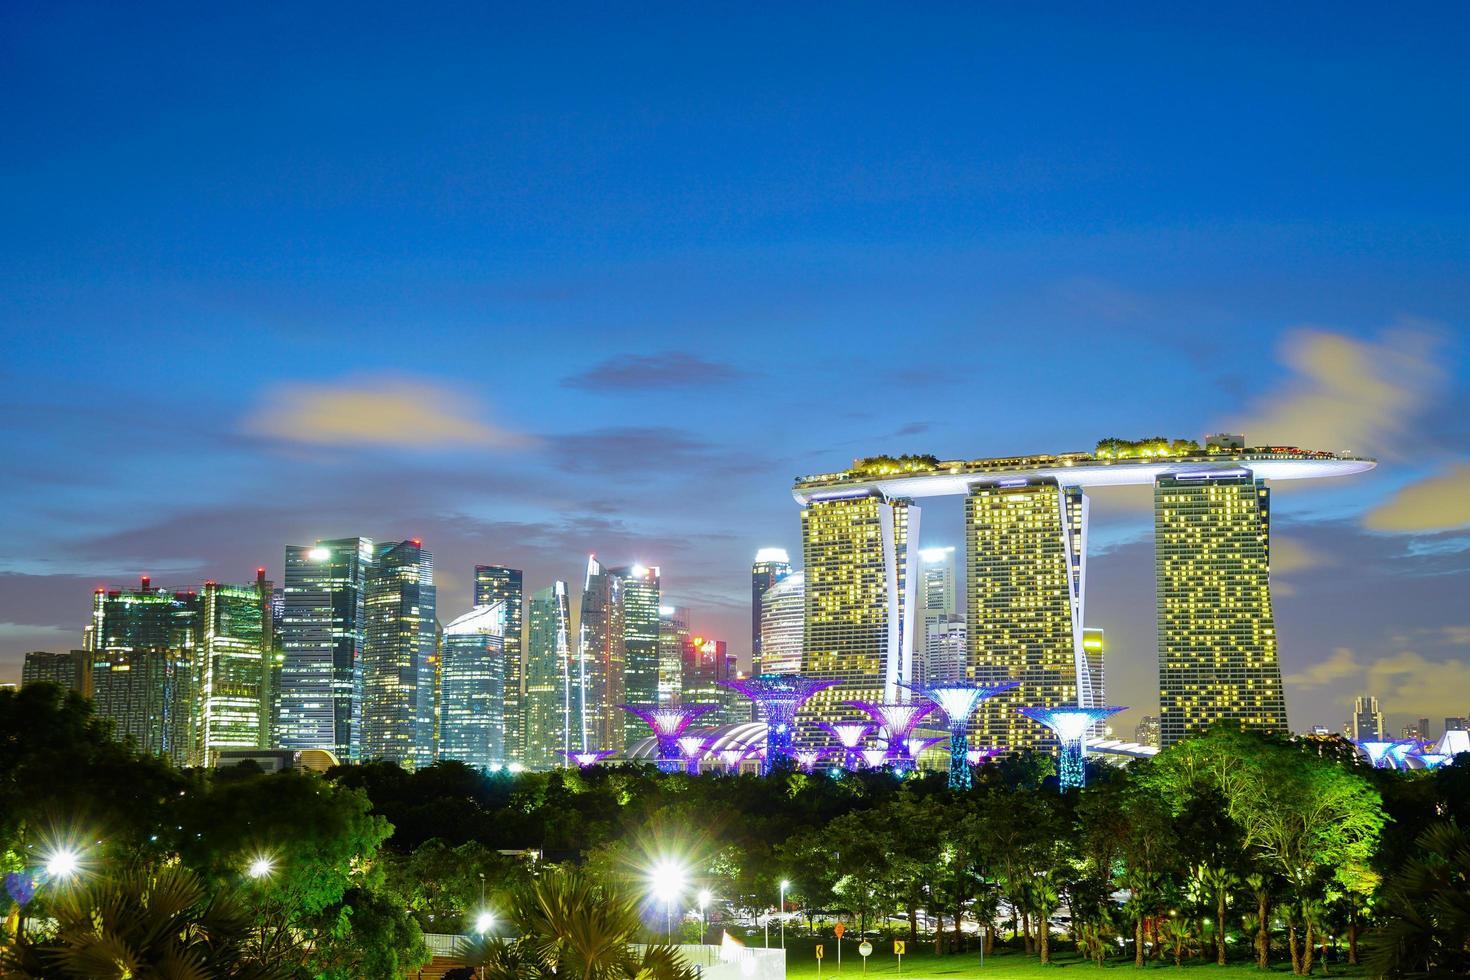 stadsgezicht van Singapore bij nacht foto